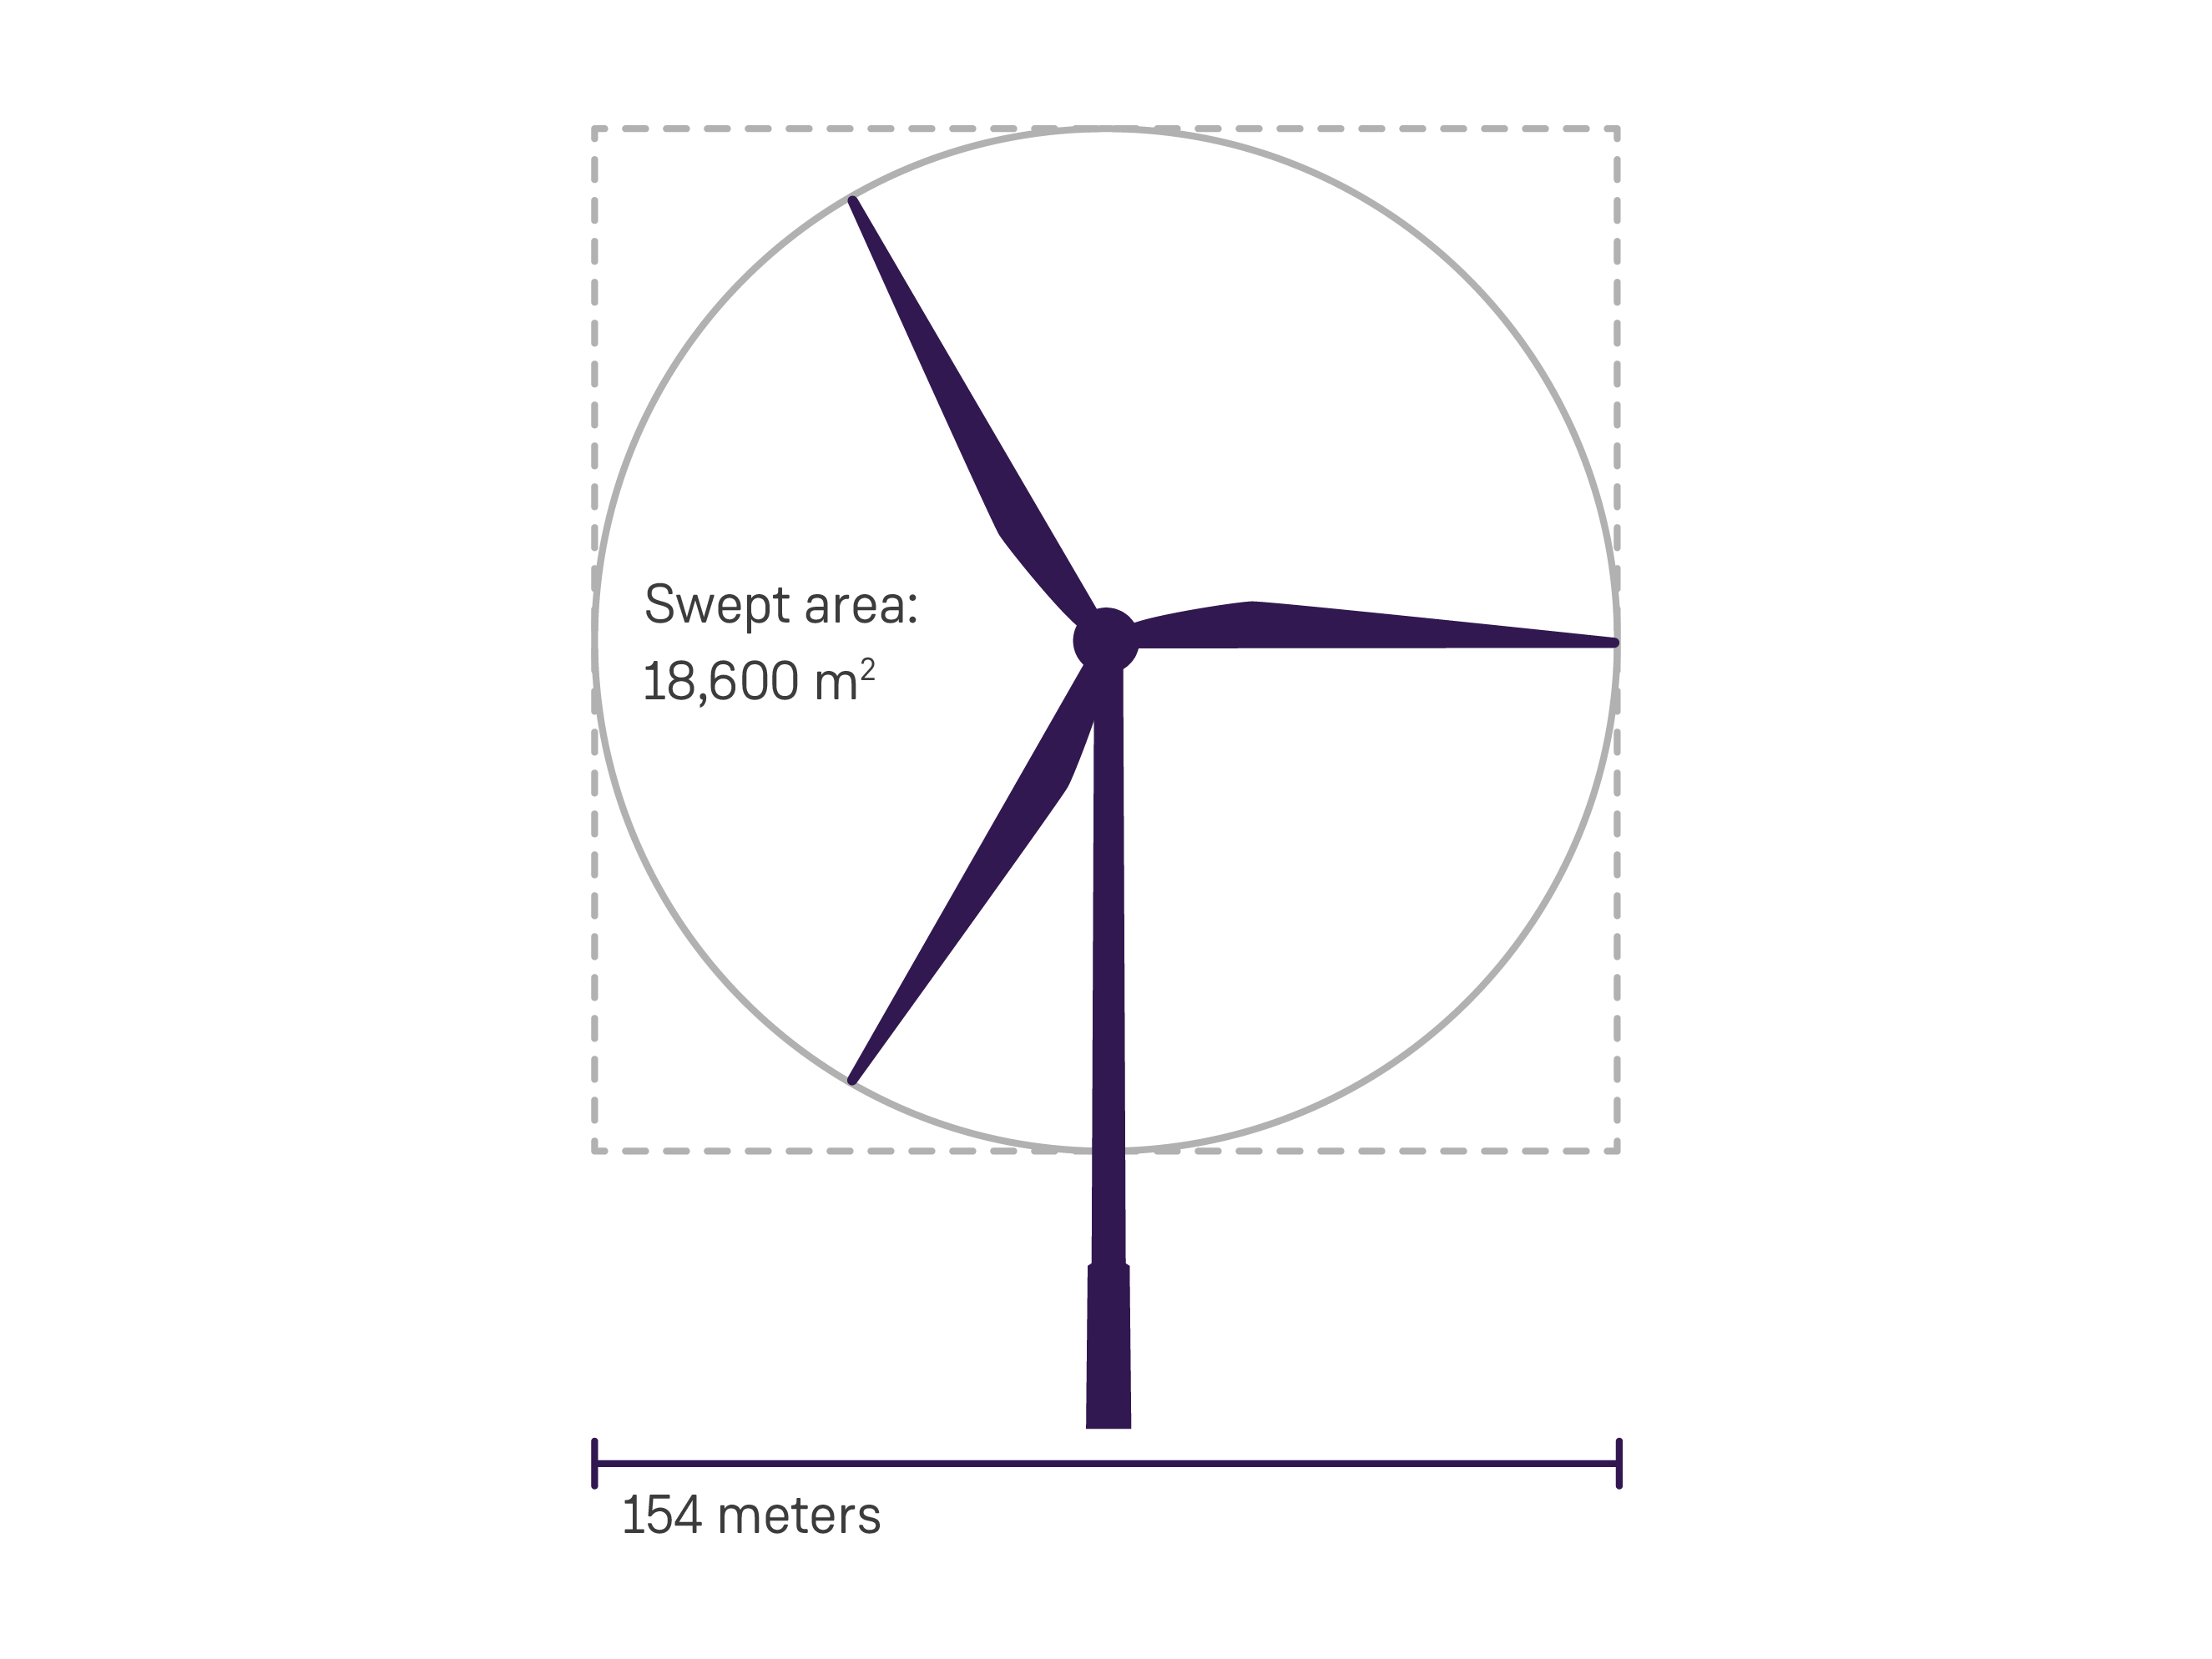 offshore wind turbine swt